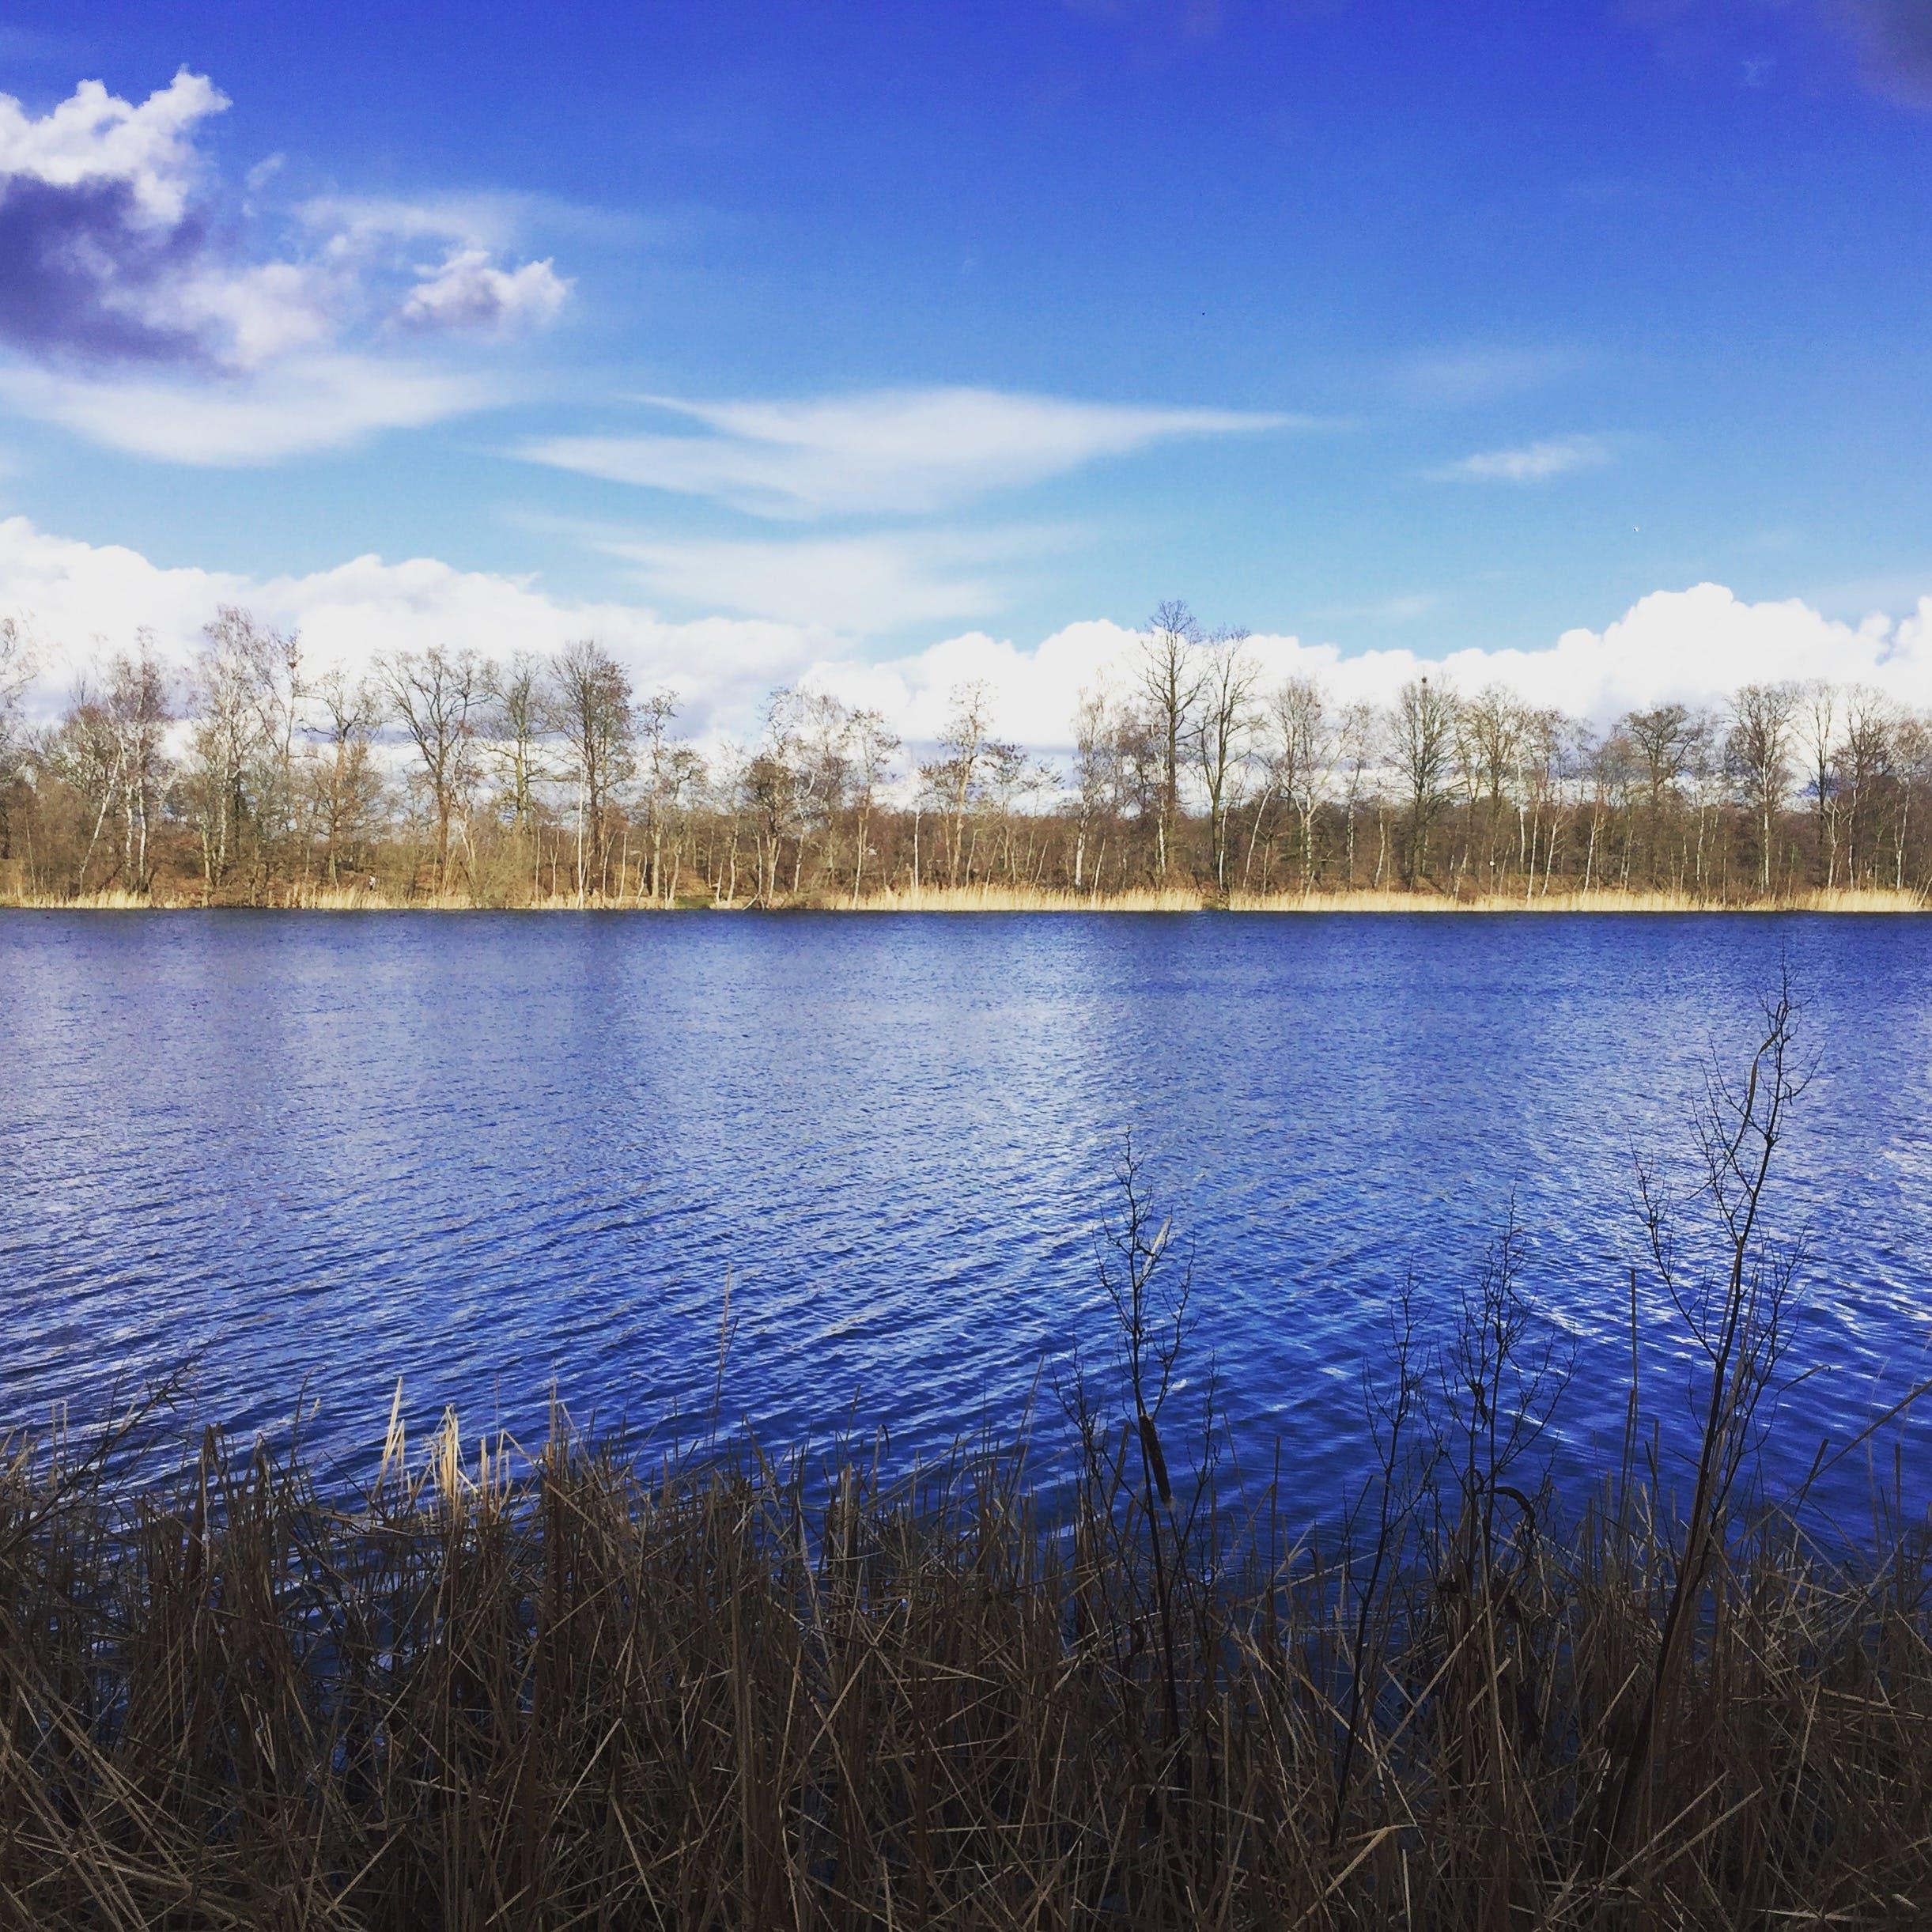 Kostenloses Stock Foto zu bäume, blau, himmel, kristall